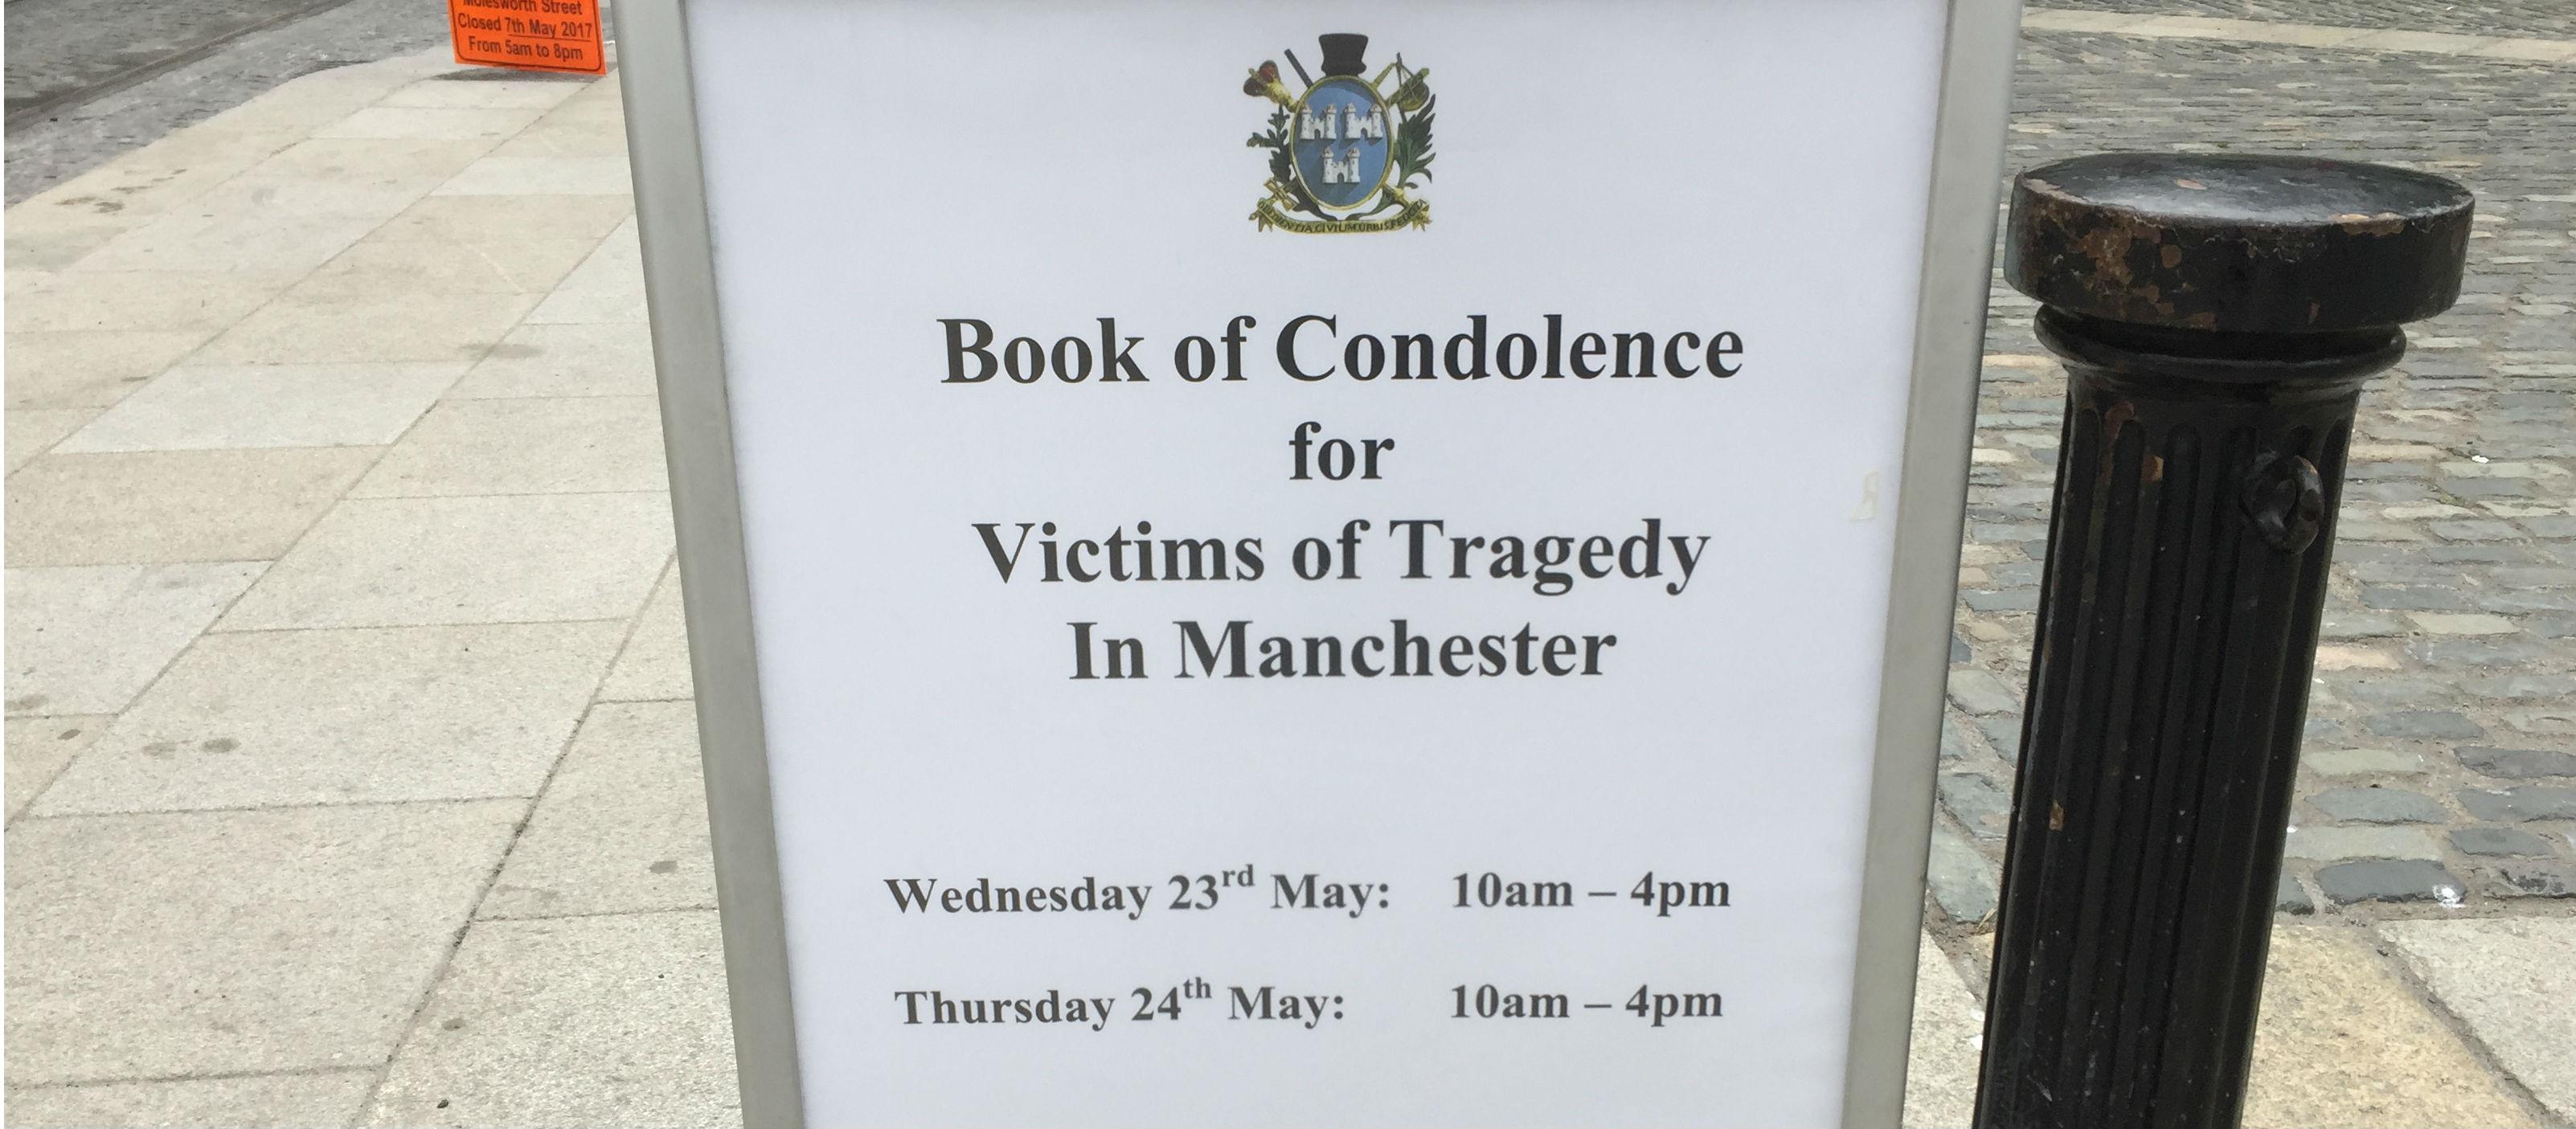 Dublin Opens Book Of Condolence For Manchester